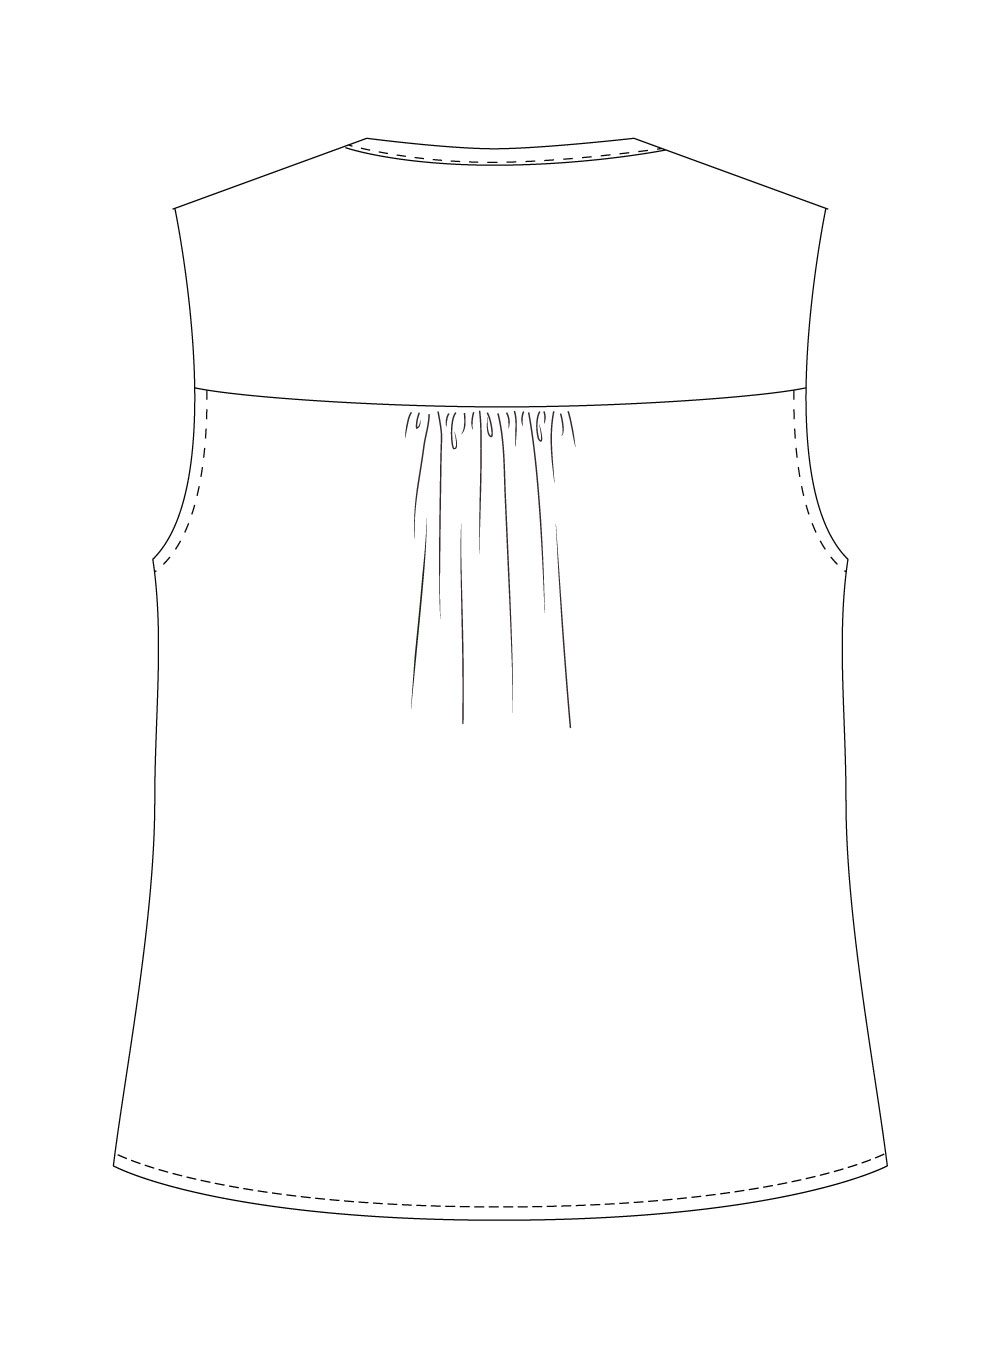 Vienna tank digital sewing pattern pdf itch to stitch vienna tank digital sewing pattern jeuxipadfo Gallery